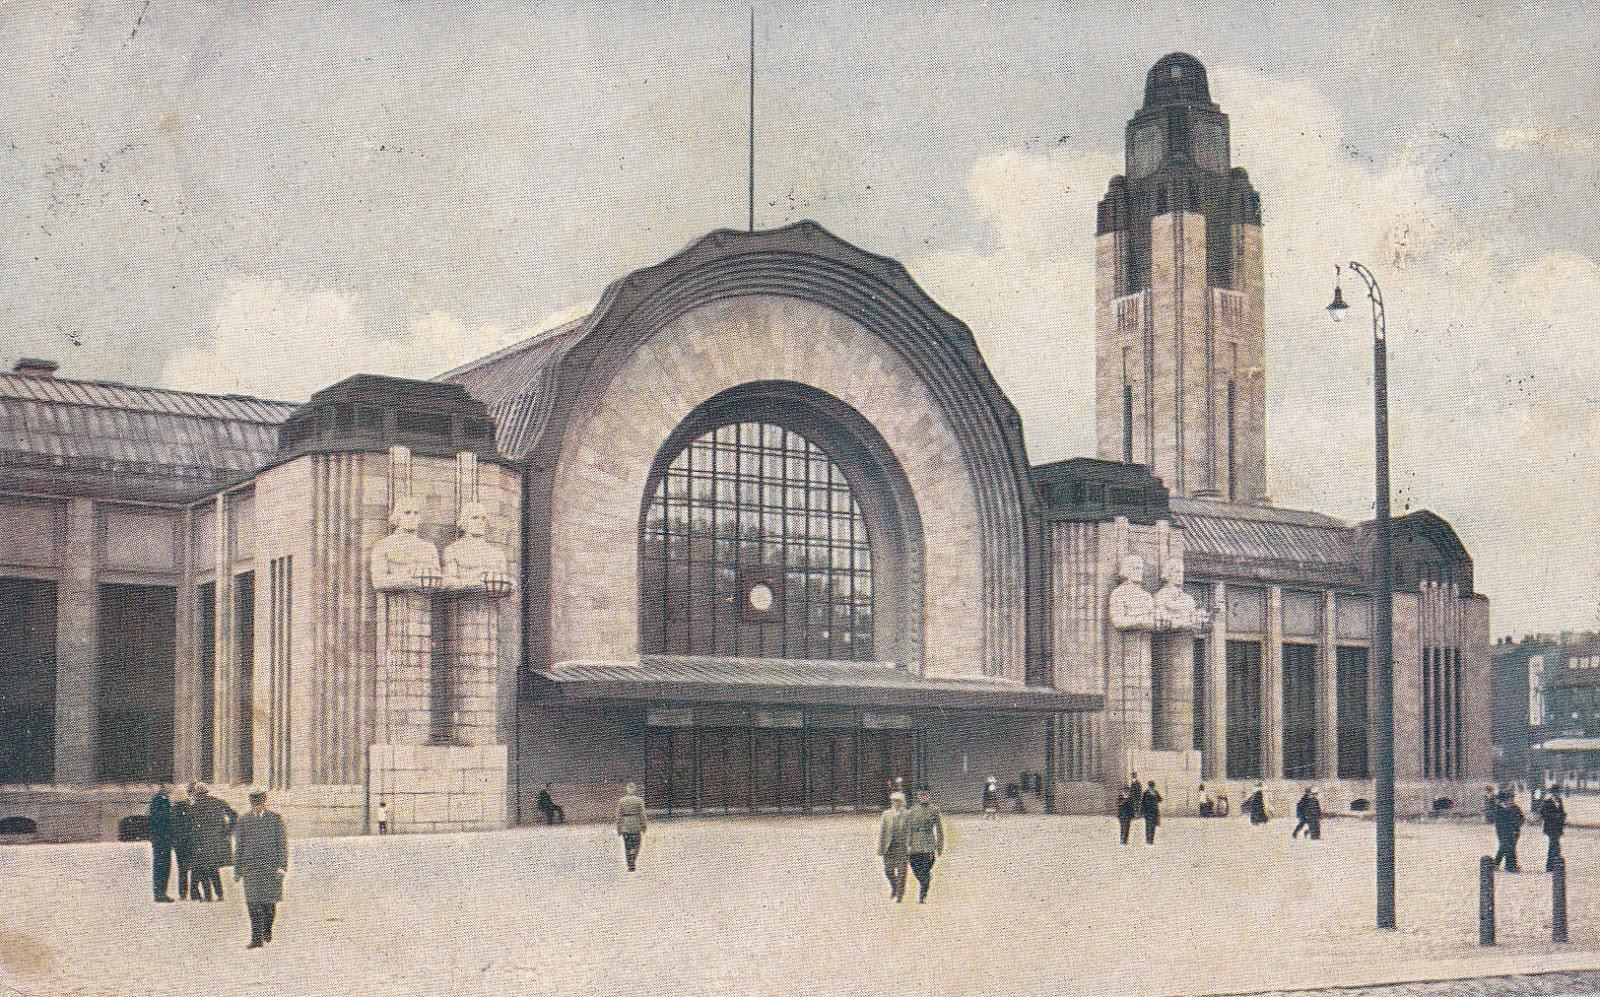 Rautatieasema Helsinki